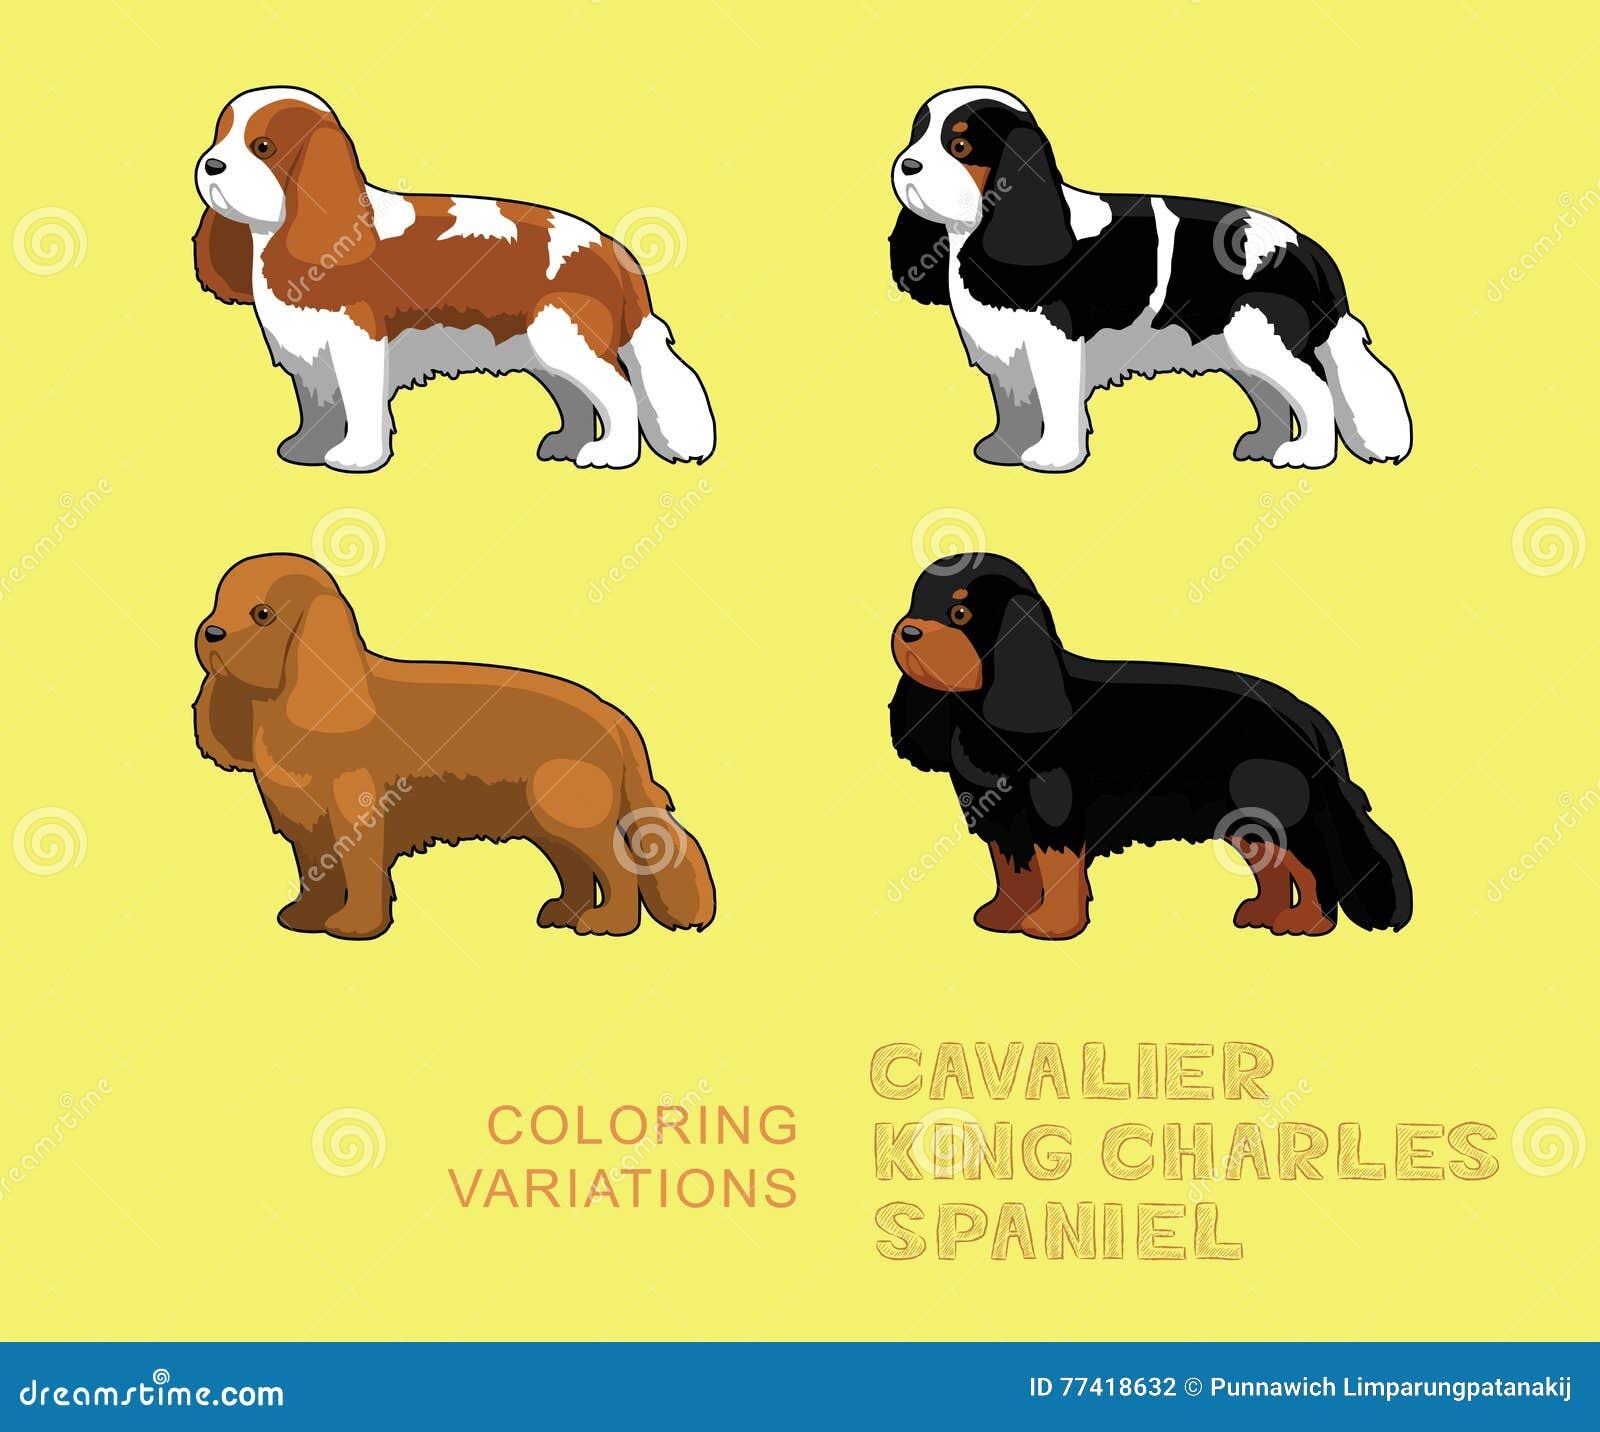 Download Dog Cavalier King Charles Spaniel Coloring Variations Vector Illustration Stock